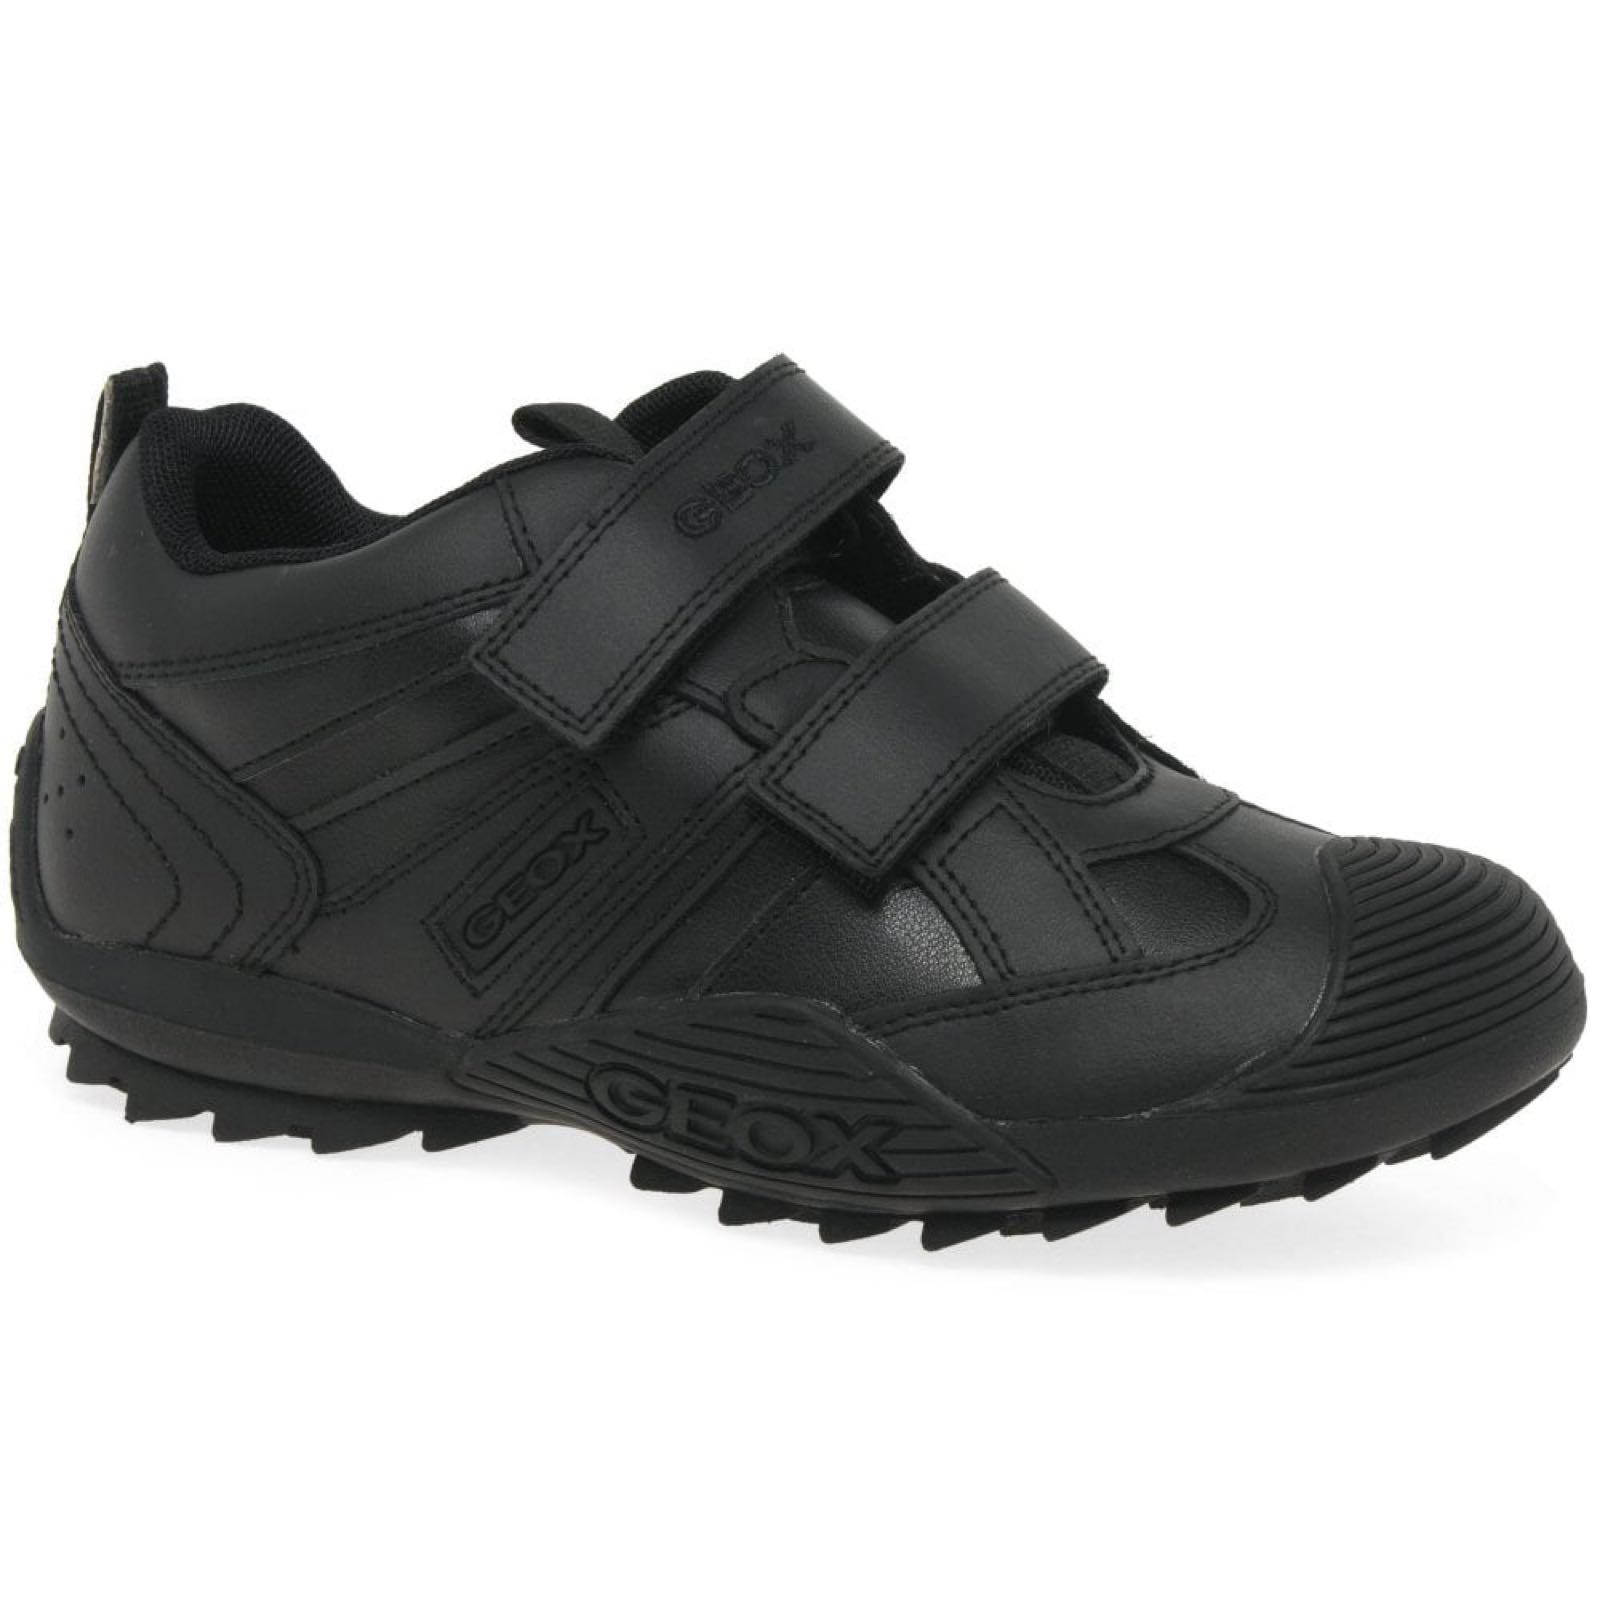 School Shoes GEOX Amphibious SAVAGE J841WB_END OF LINE